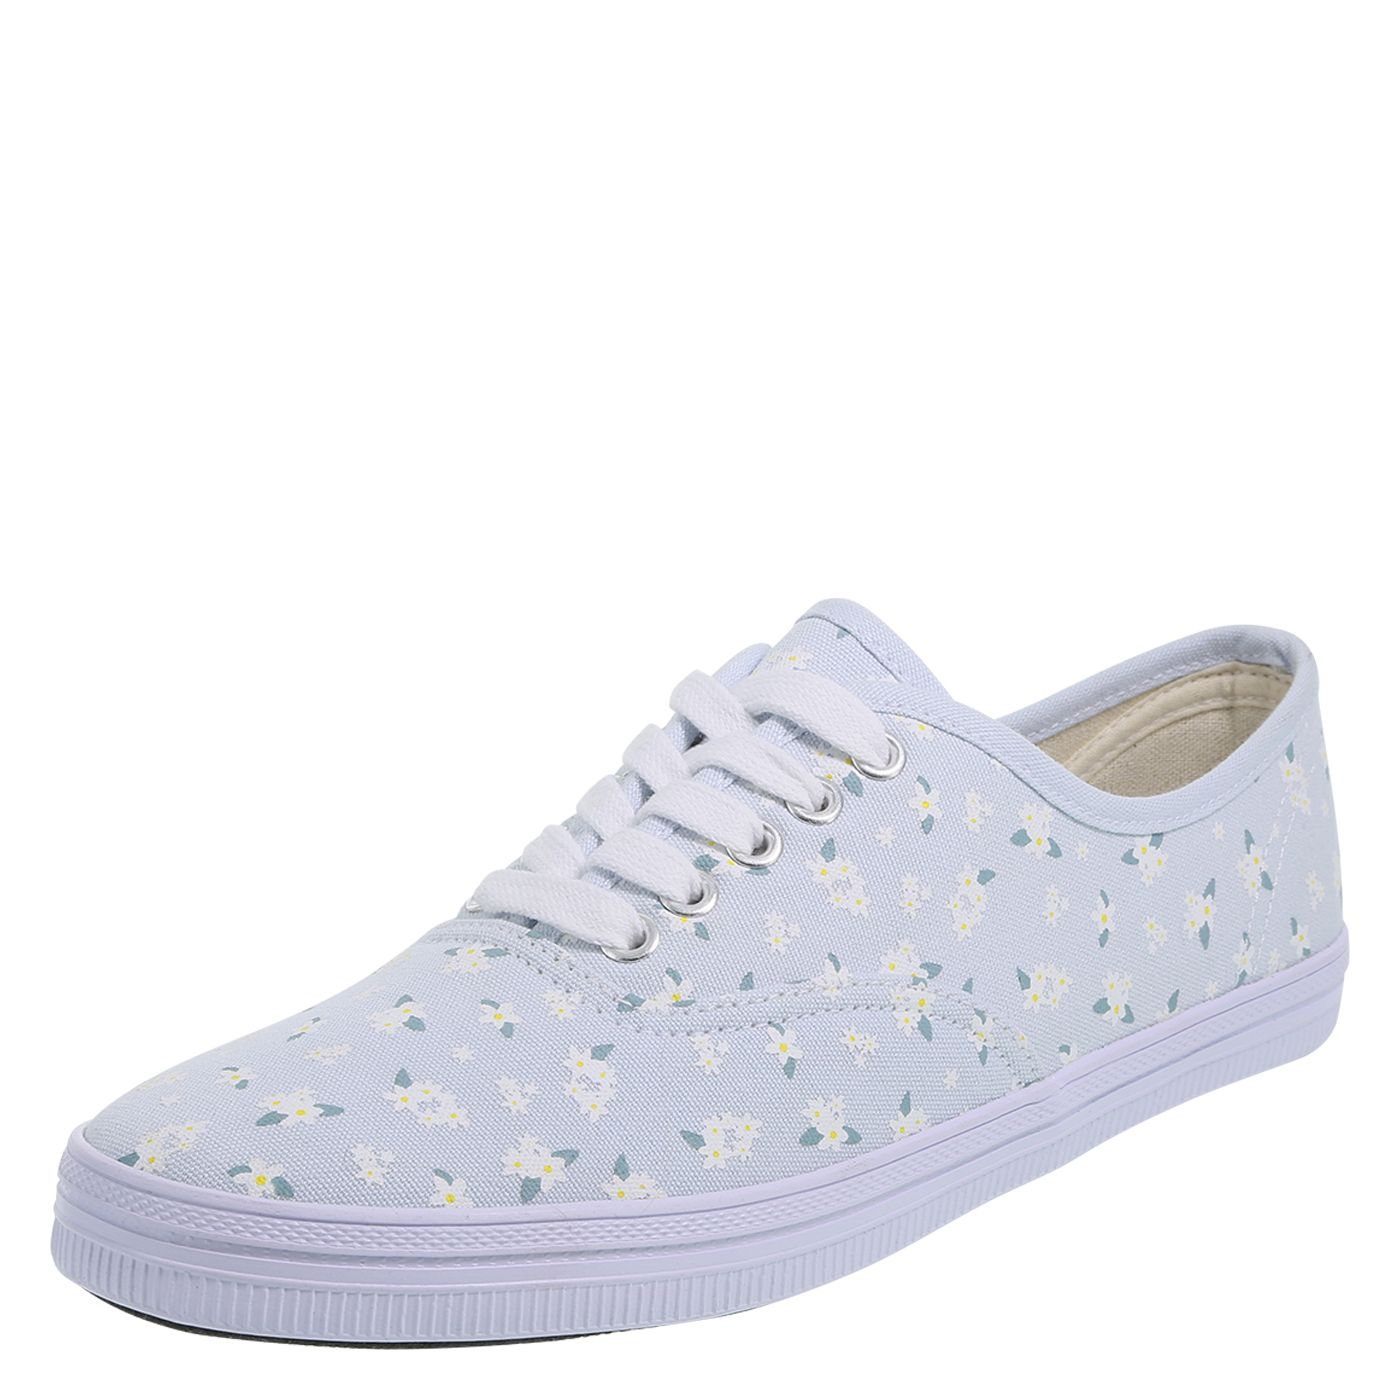 2e0b466917e65 American Eagle Classic Women s Bal Sneaker Shoe